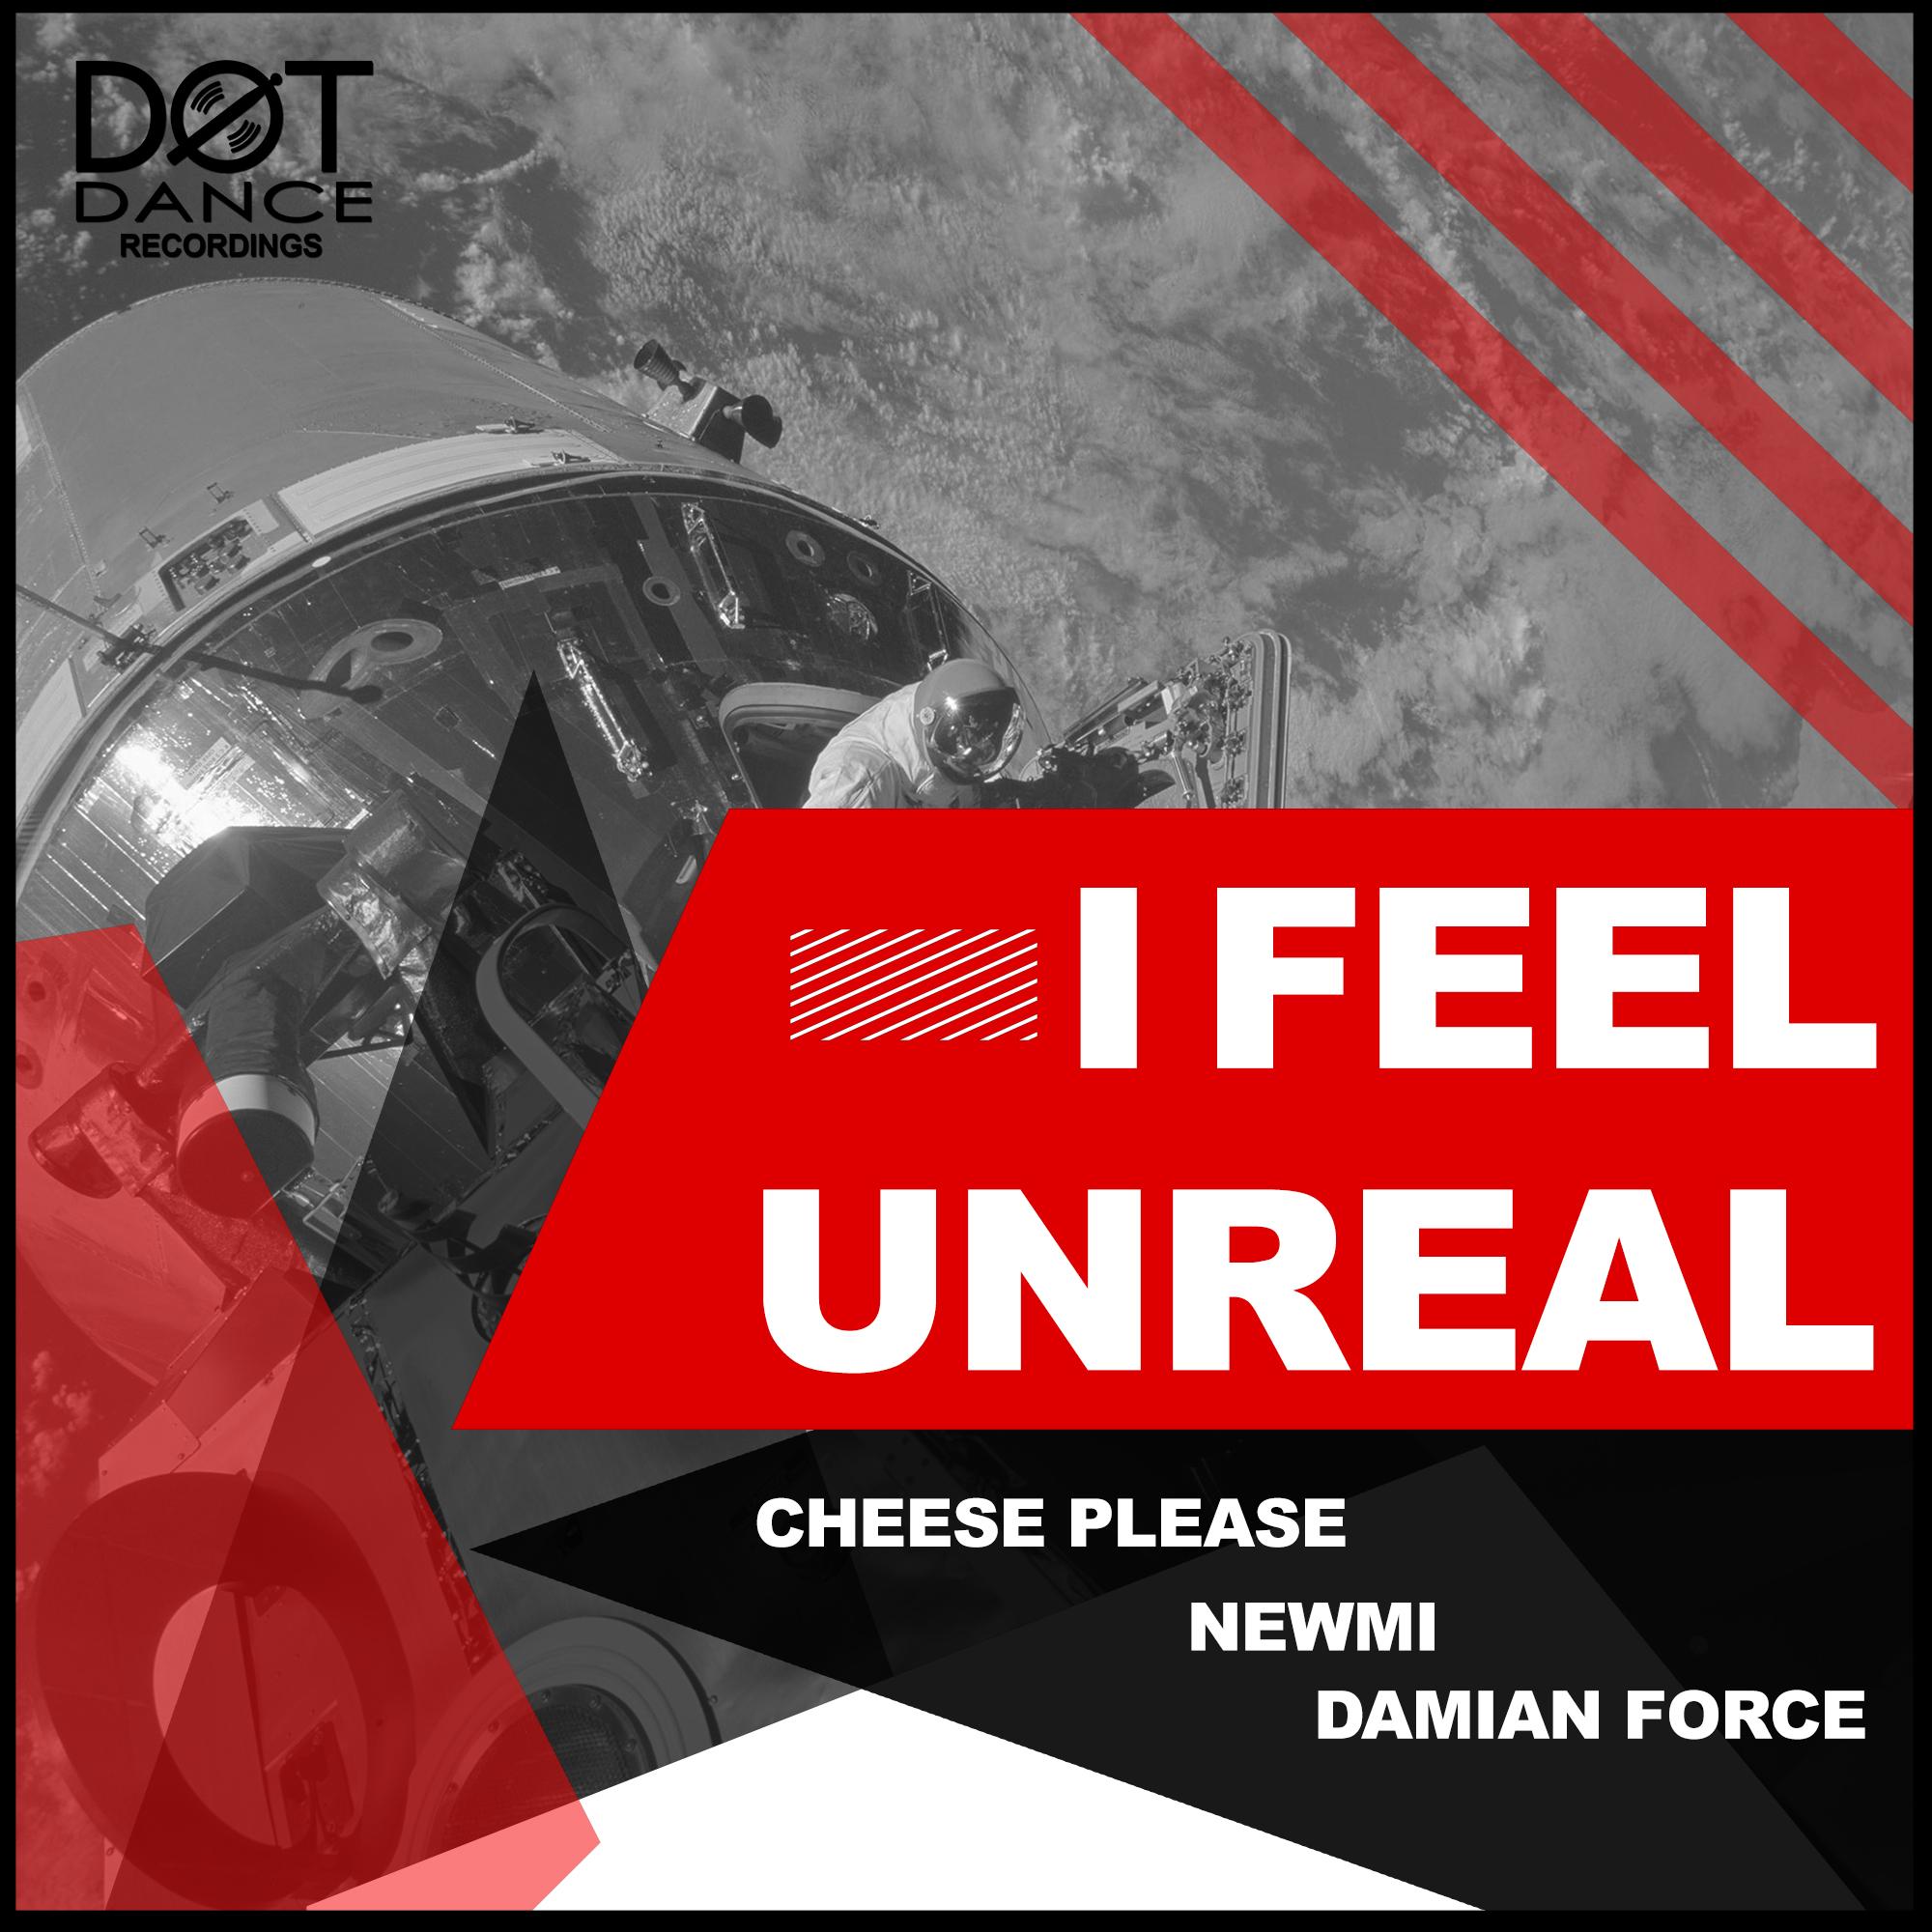 Damian Force Cheese Please Newmi